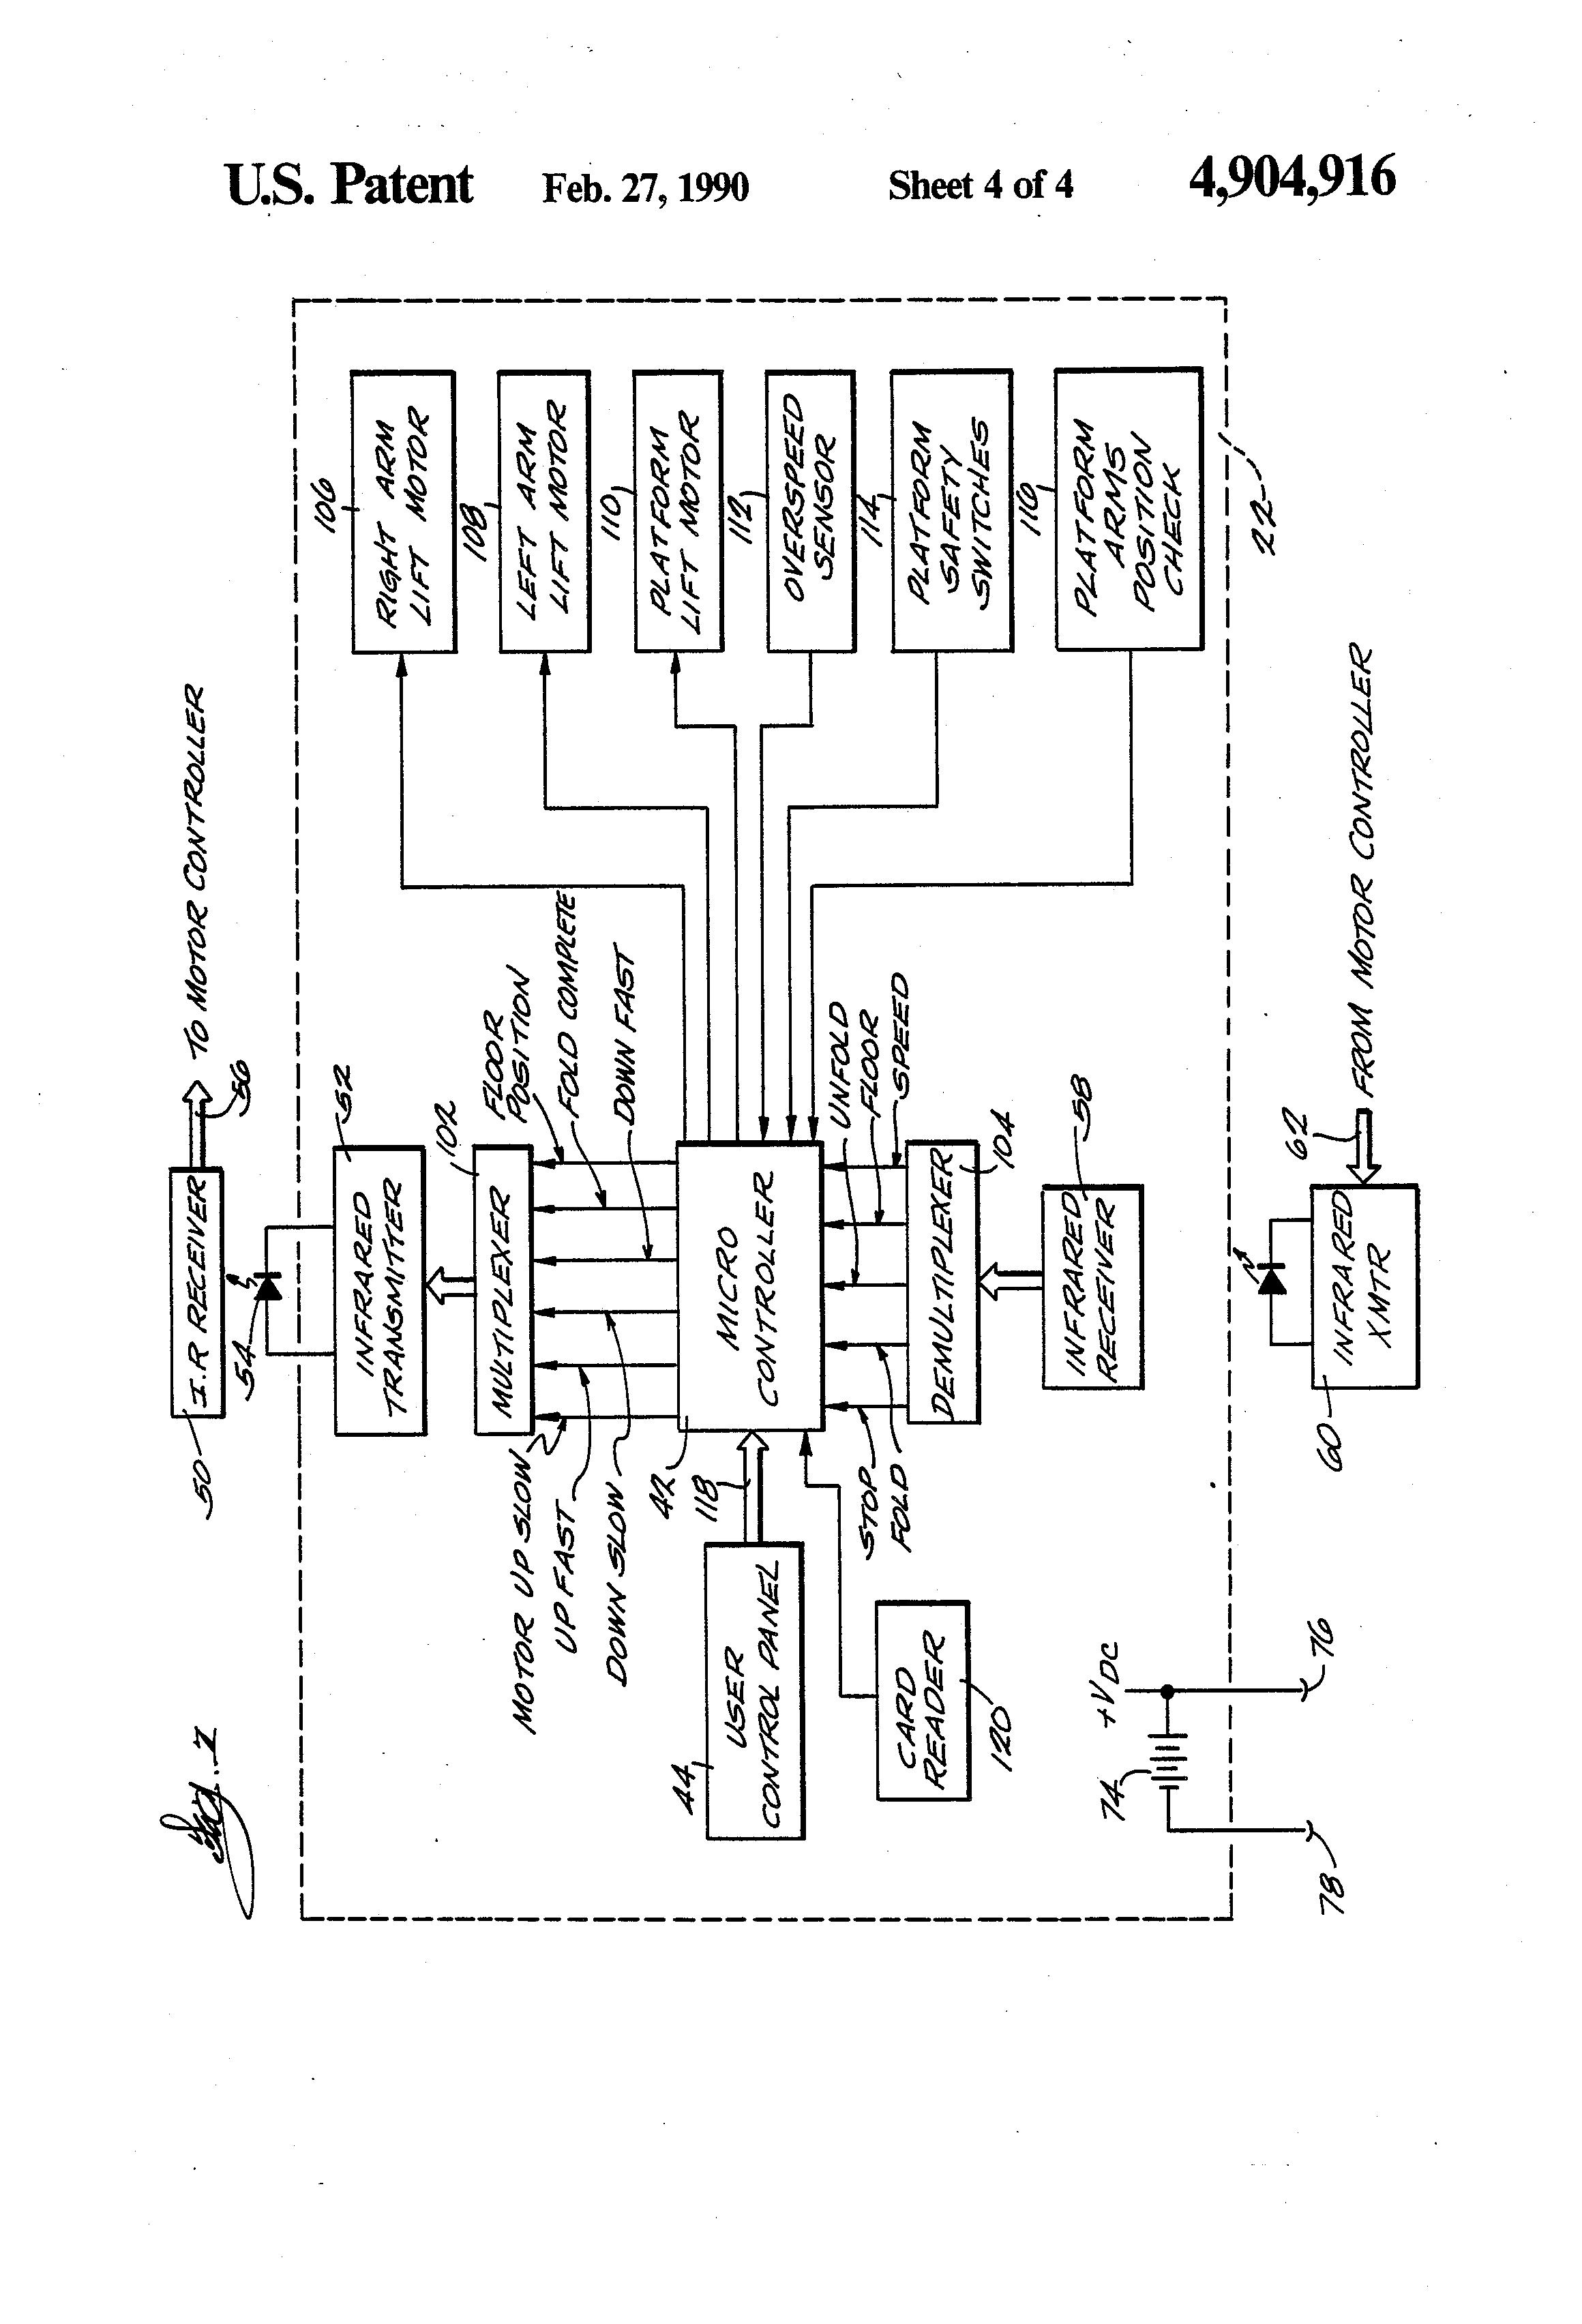 excel stair lift wiring diagram pinhole board camera wiring diagram Lift Warning Diagram Diagram Wiring Danmarlift